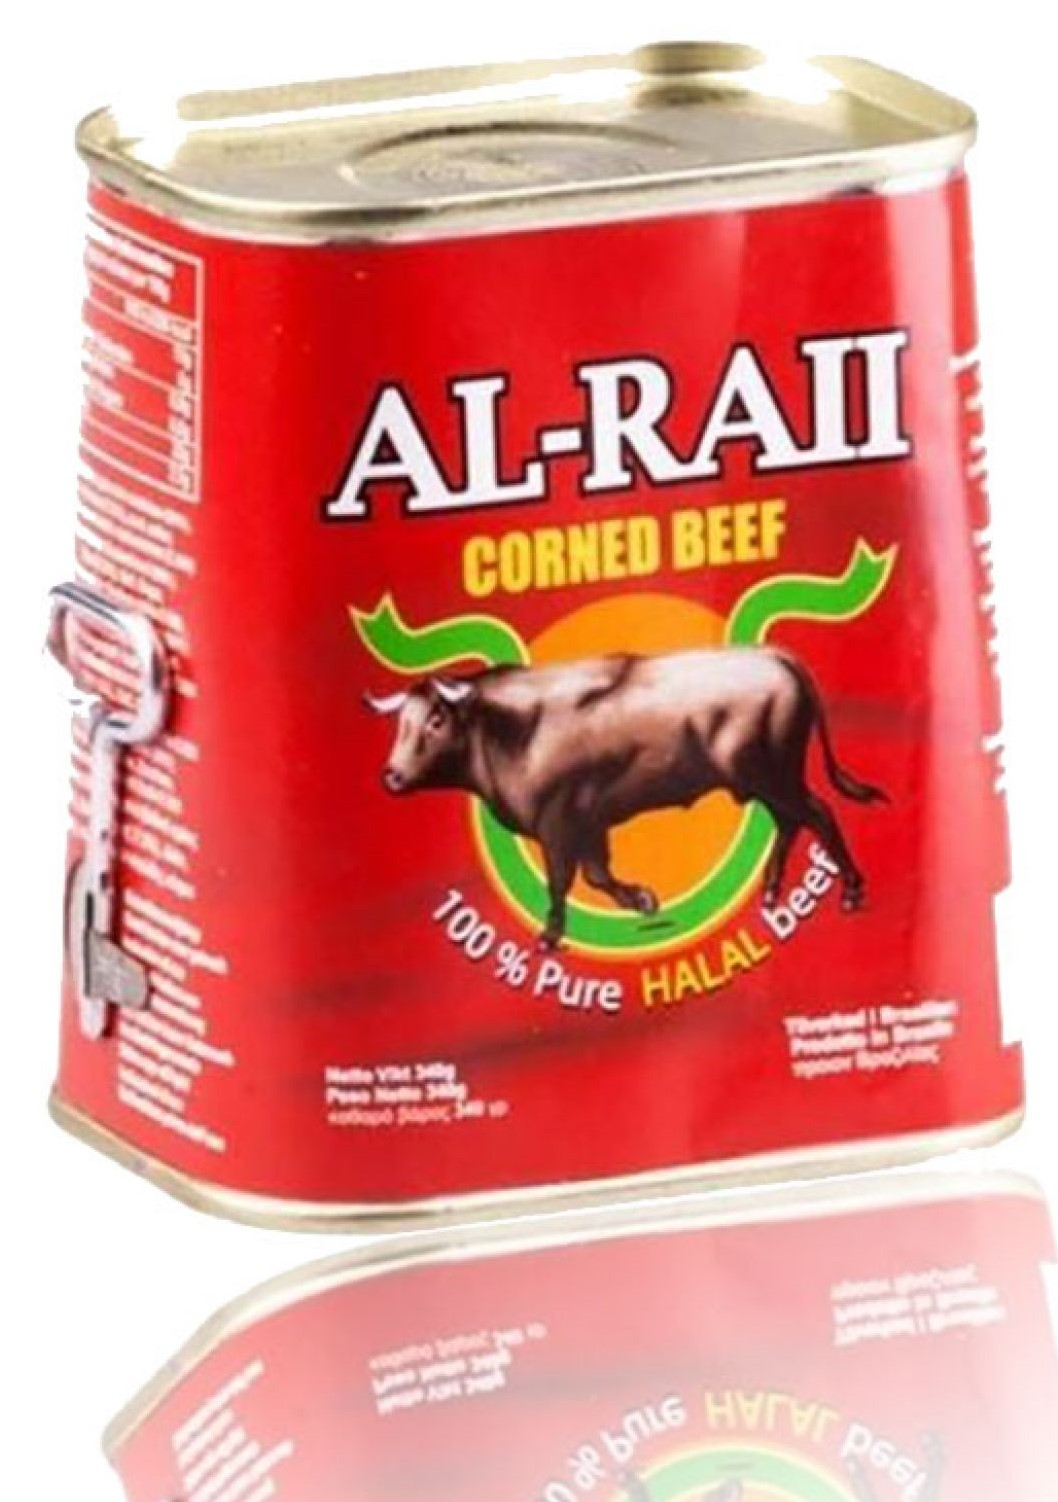 Al Raii Corned Beef Brazil 198g الراعي كورن بيف لحم  بقر